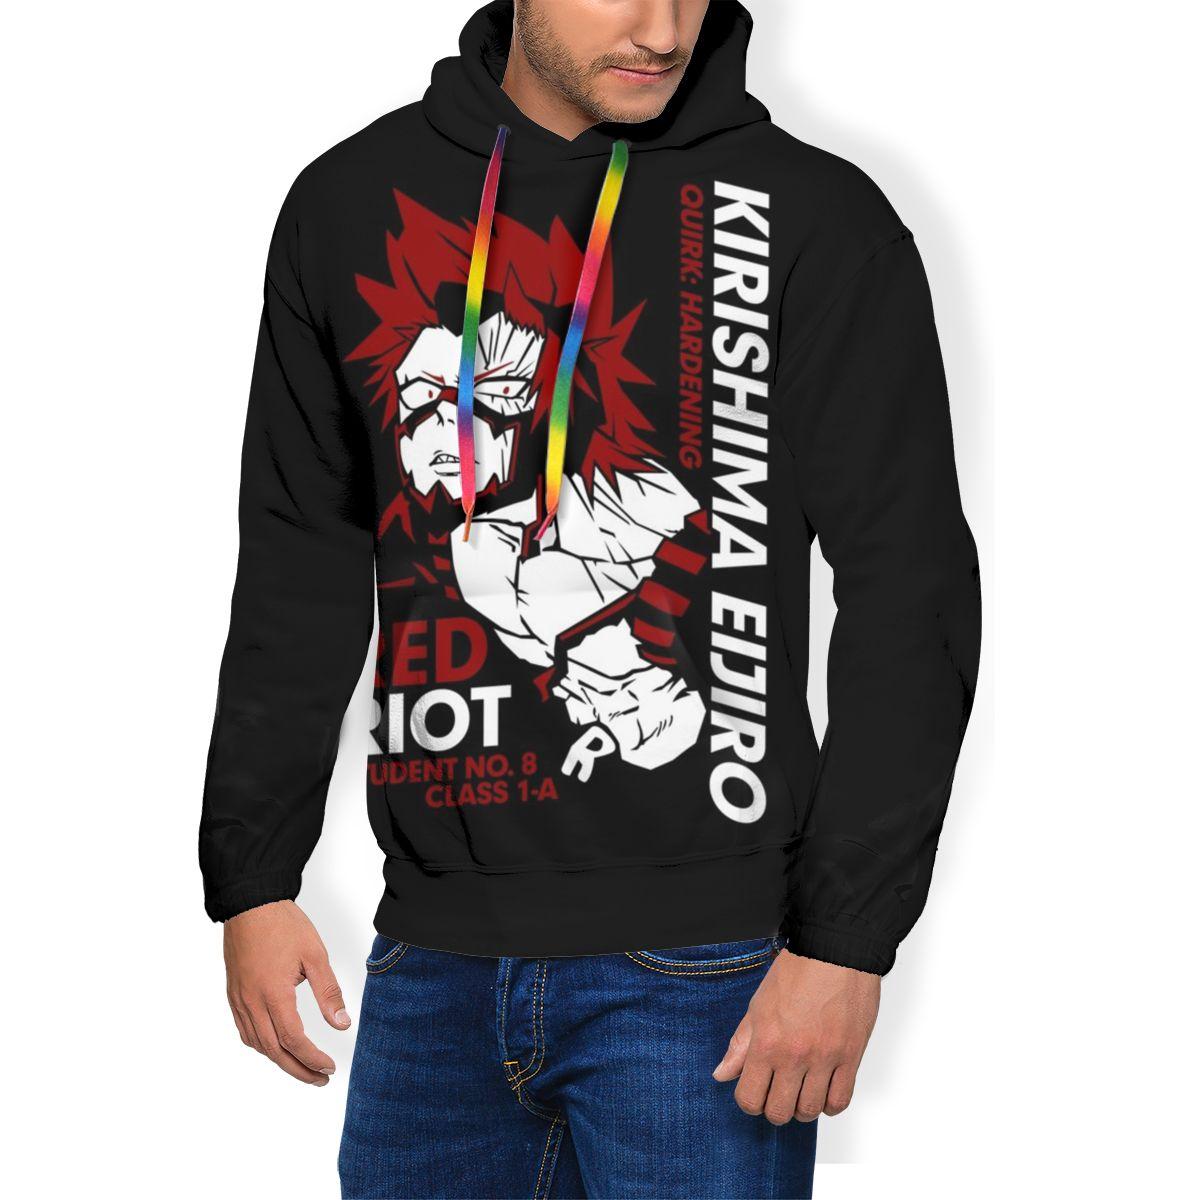 Riot Hoodie Kirishima Eijiro Hoodies X Grey Pullover Hoodie Casual Men Polyester Loose Long Autumn Hoodies